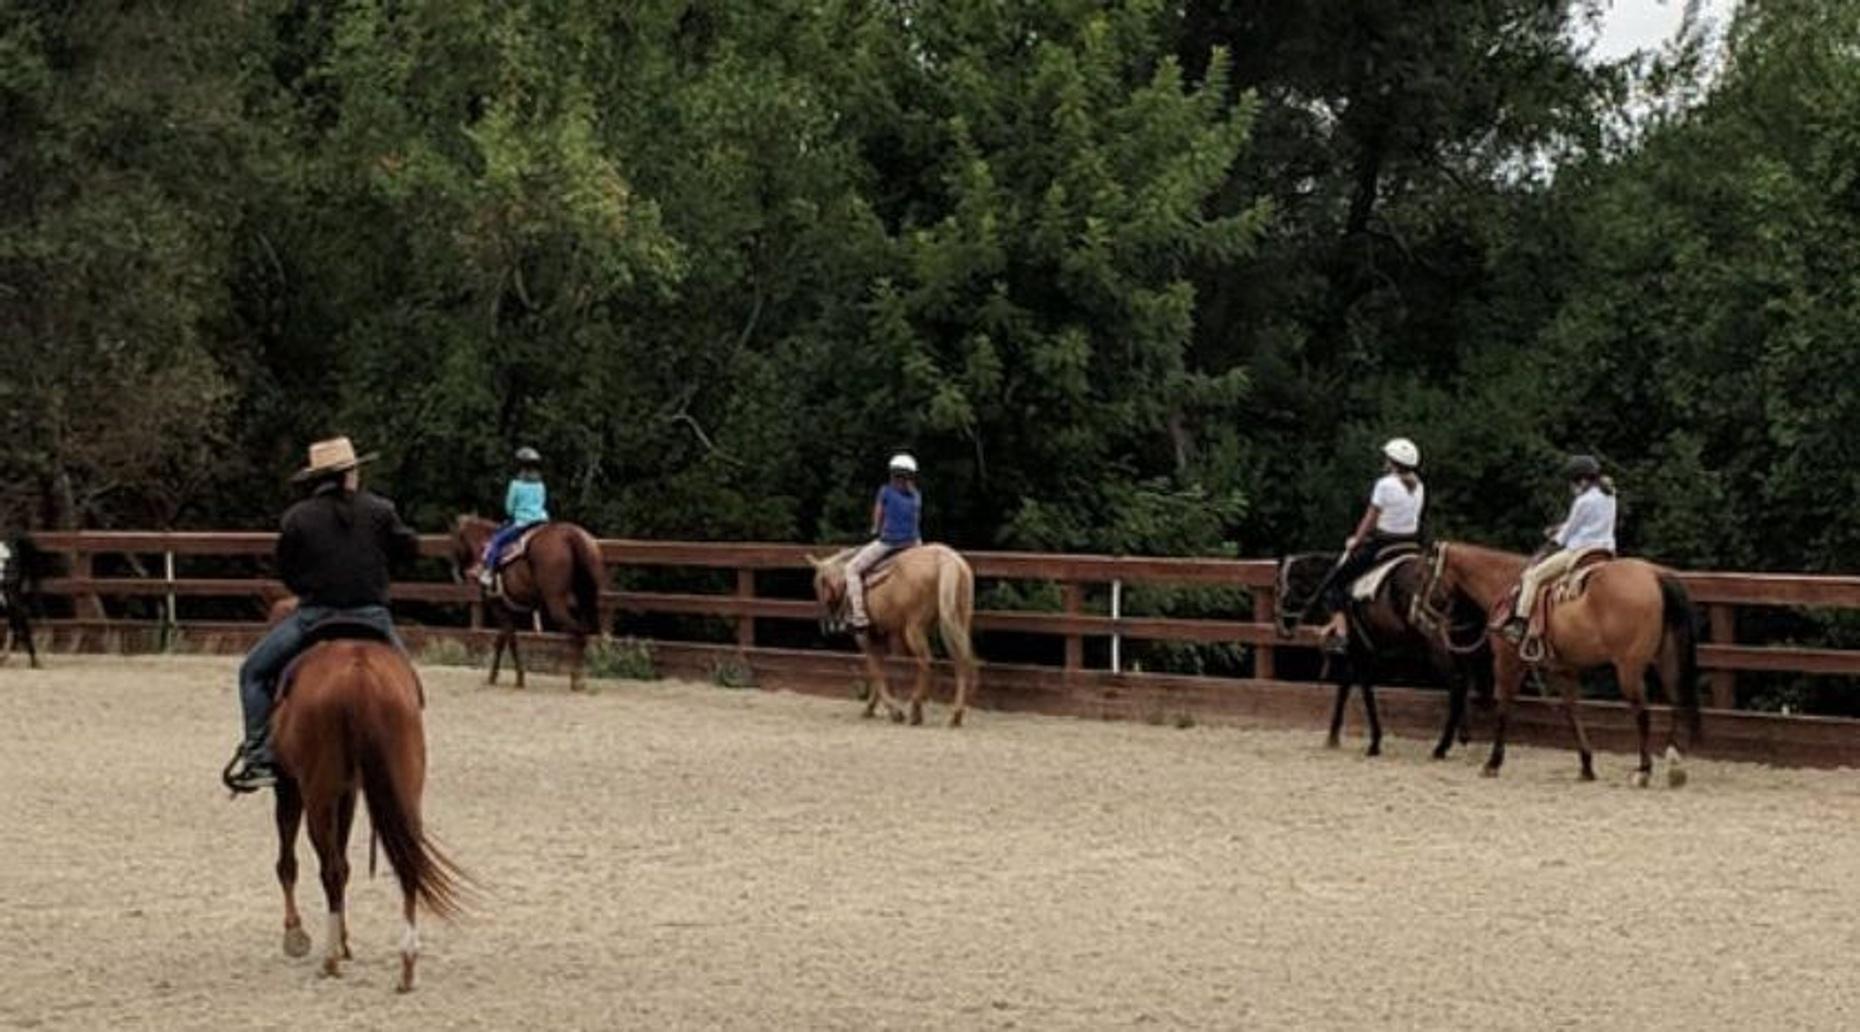 1-Hour Horseback Riding Lesson at Golden Gate Park